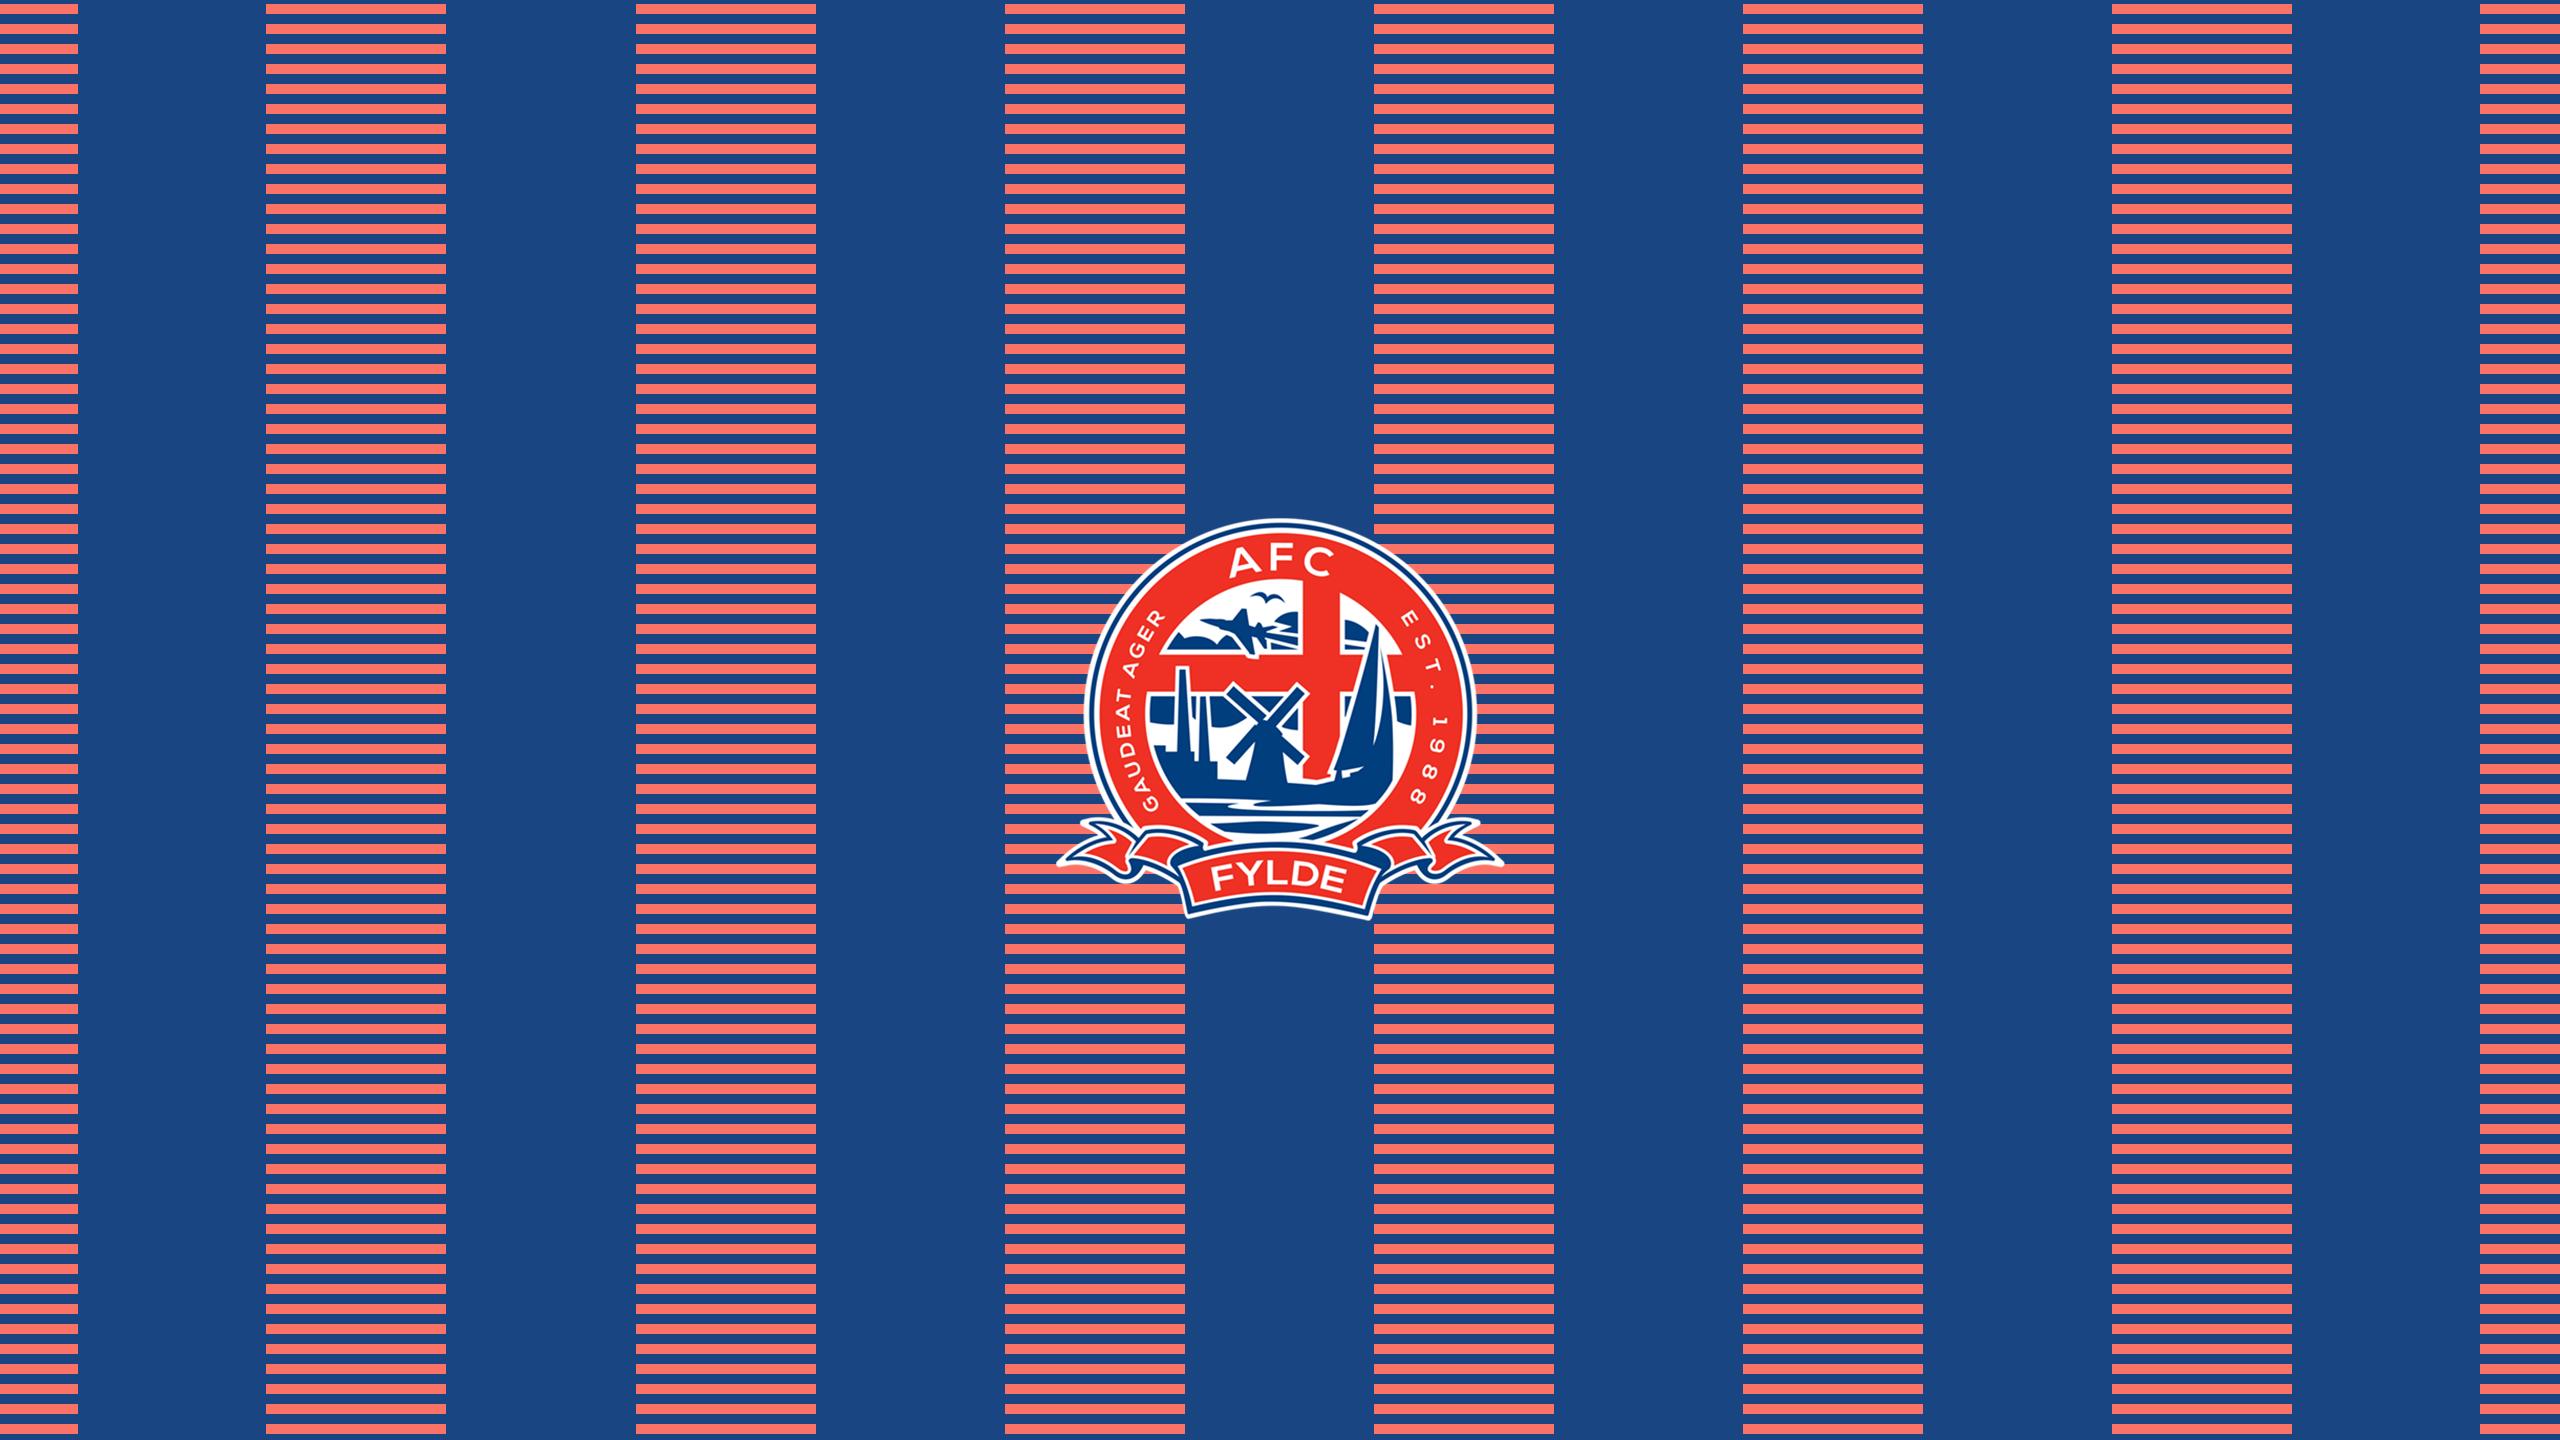 AFC Flyde (Away)